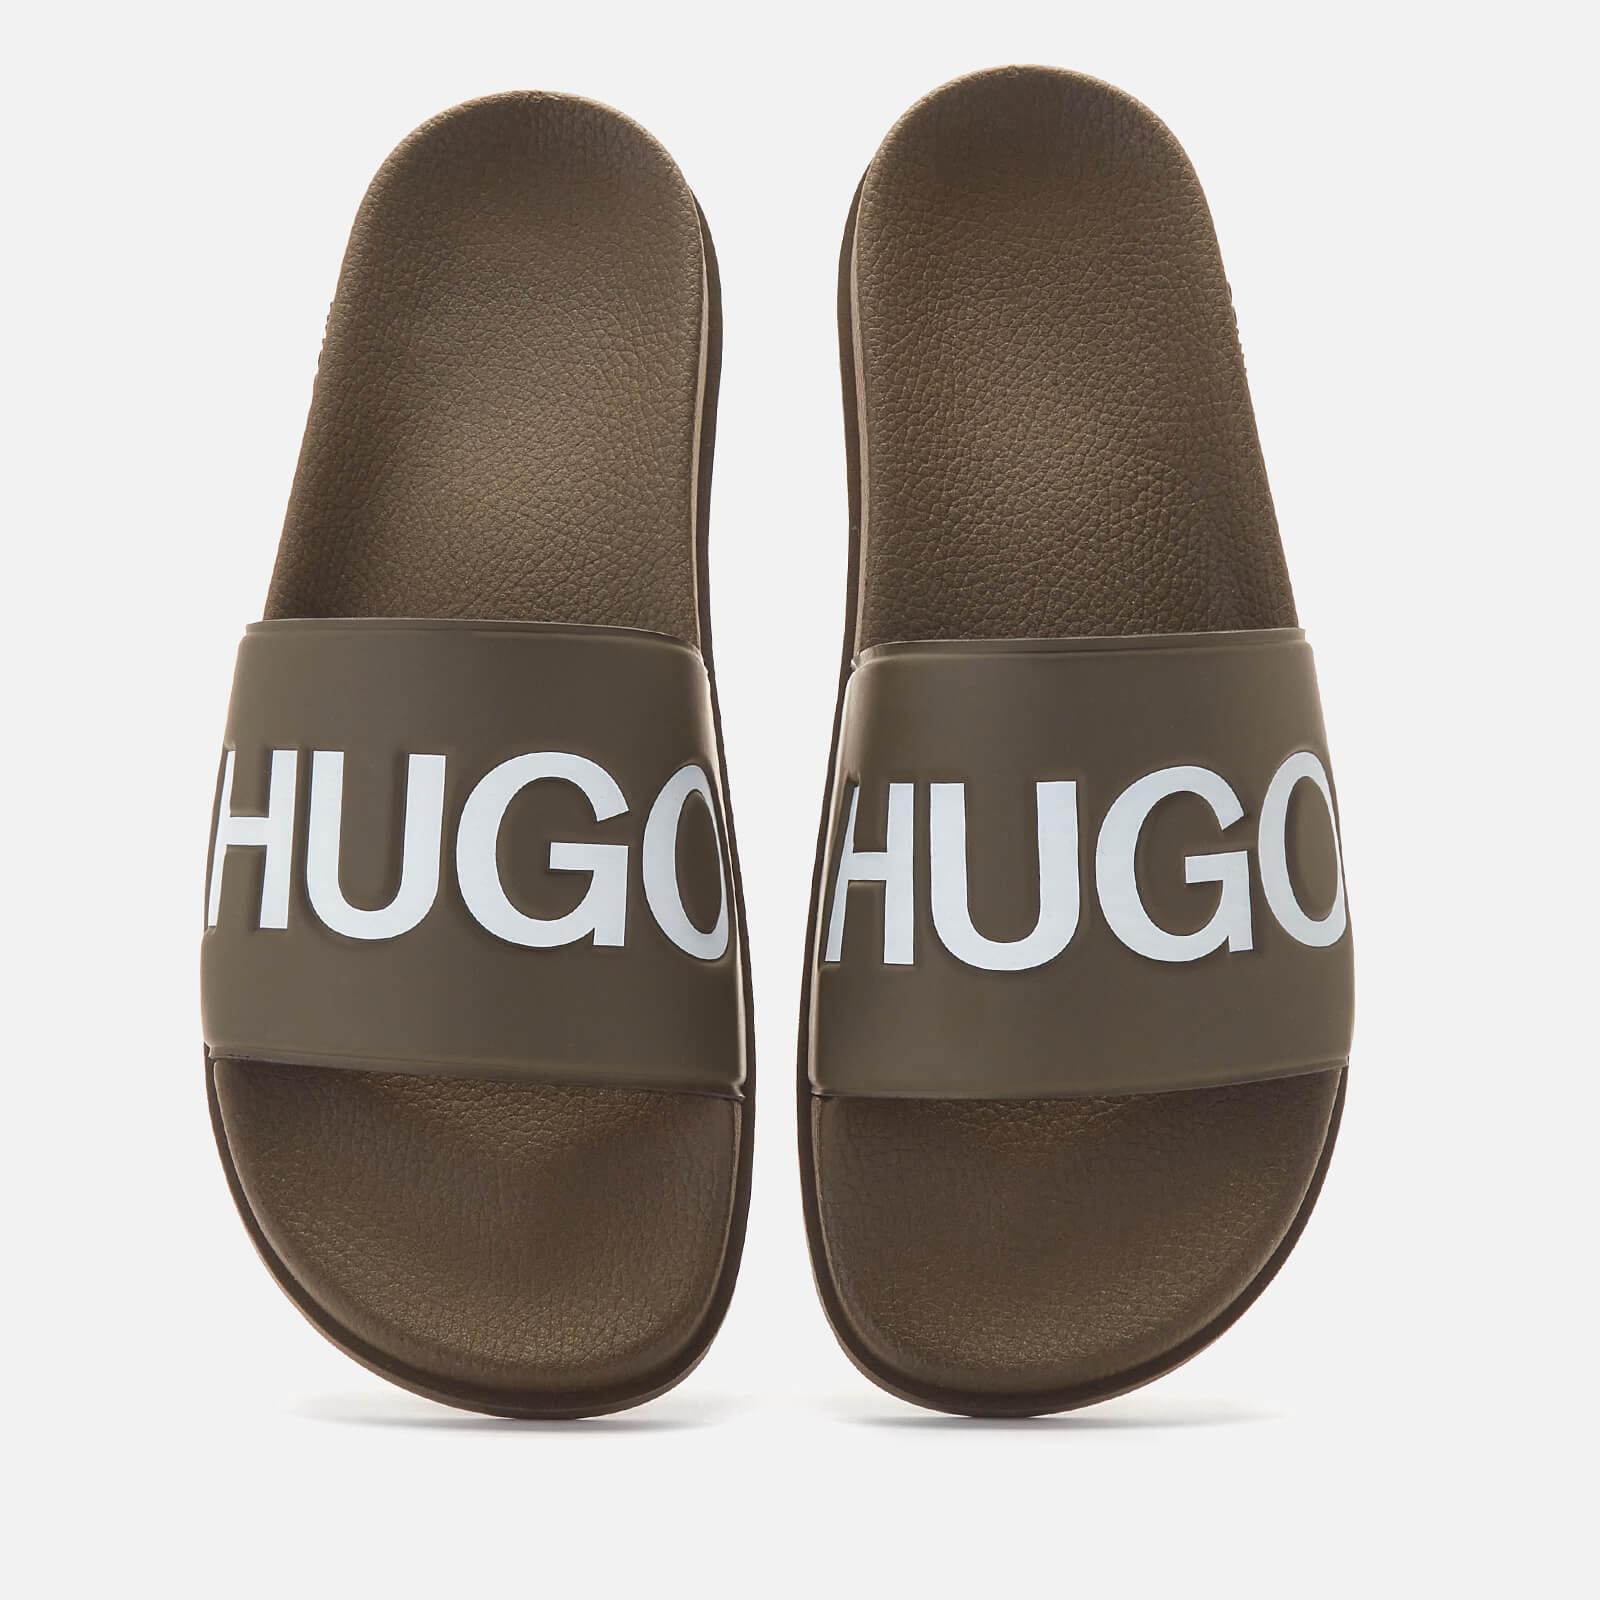 HUGO Men's Match Slide Sandals - Green - UK 7